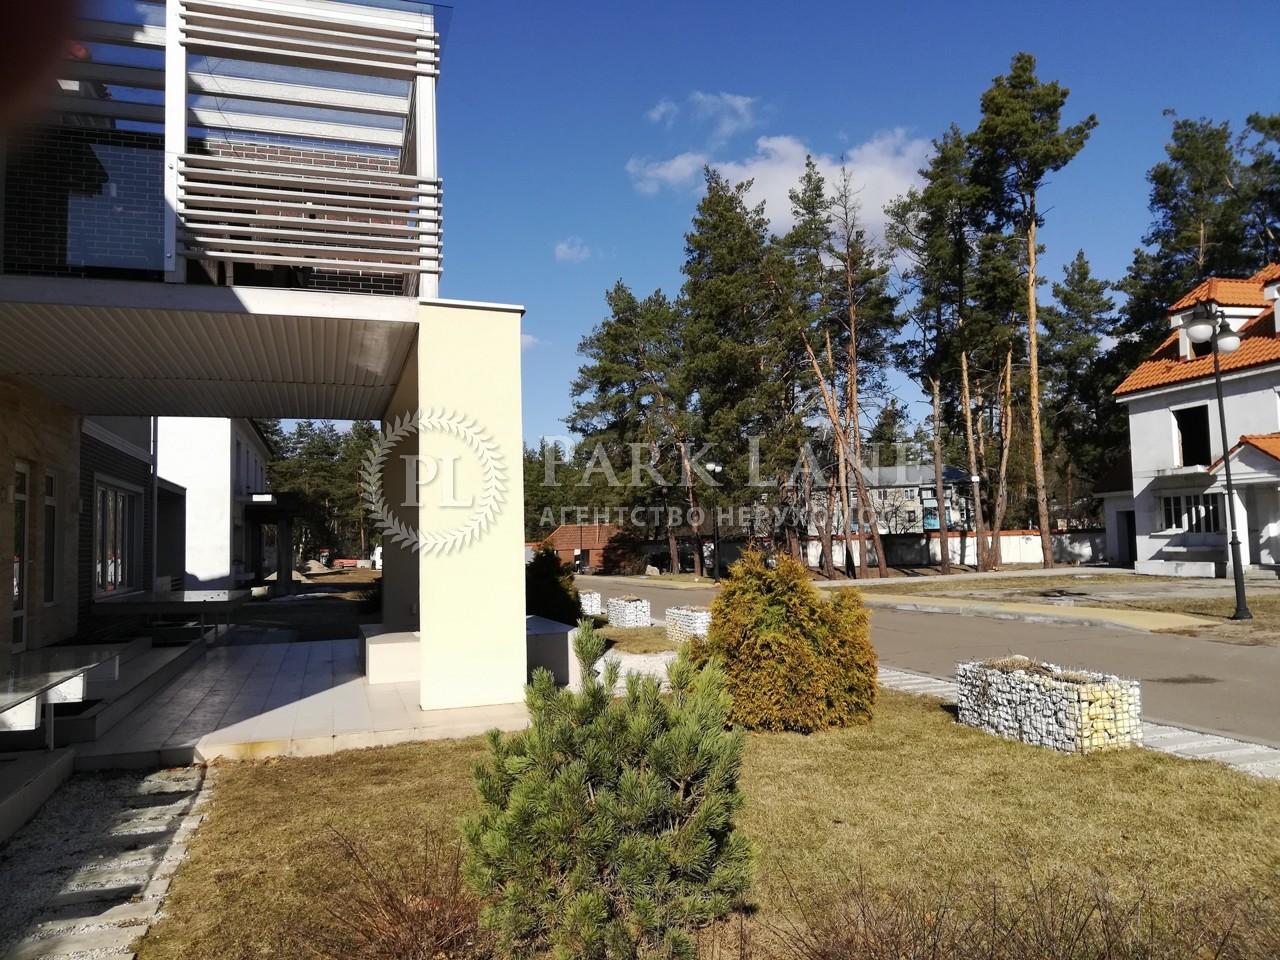 Квартира Столичное шоссе, 149, Киев, K-32683 - Фото 11